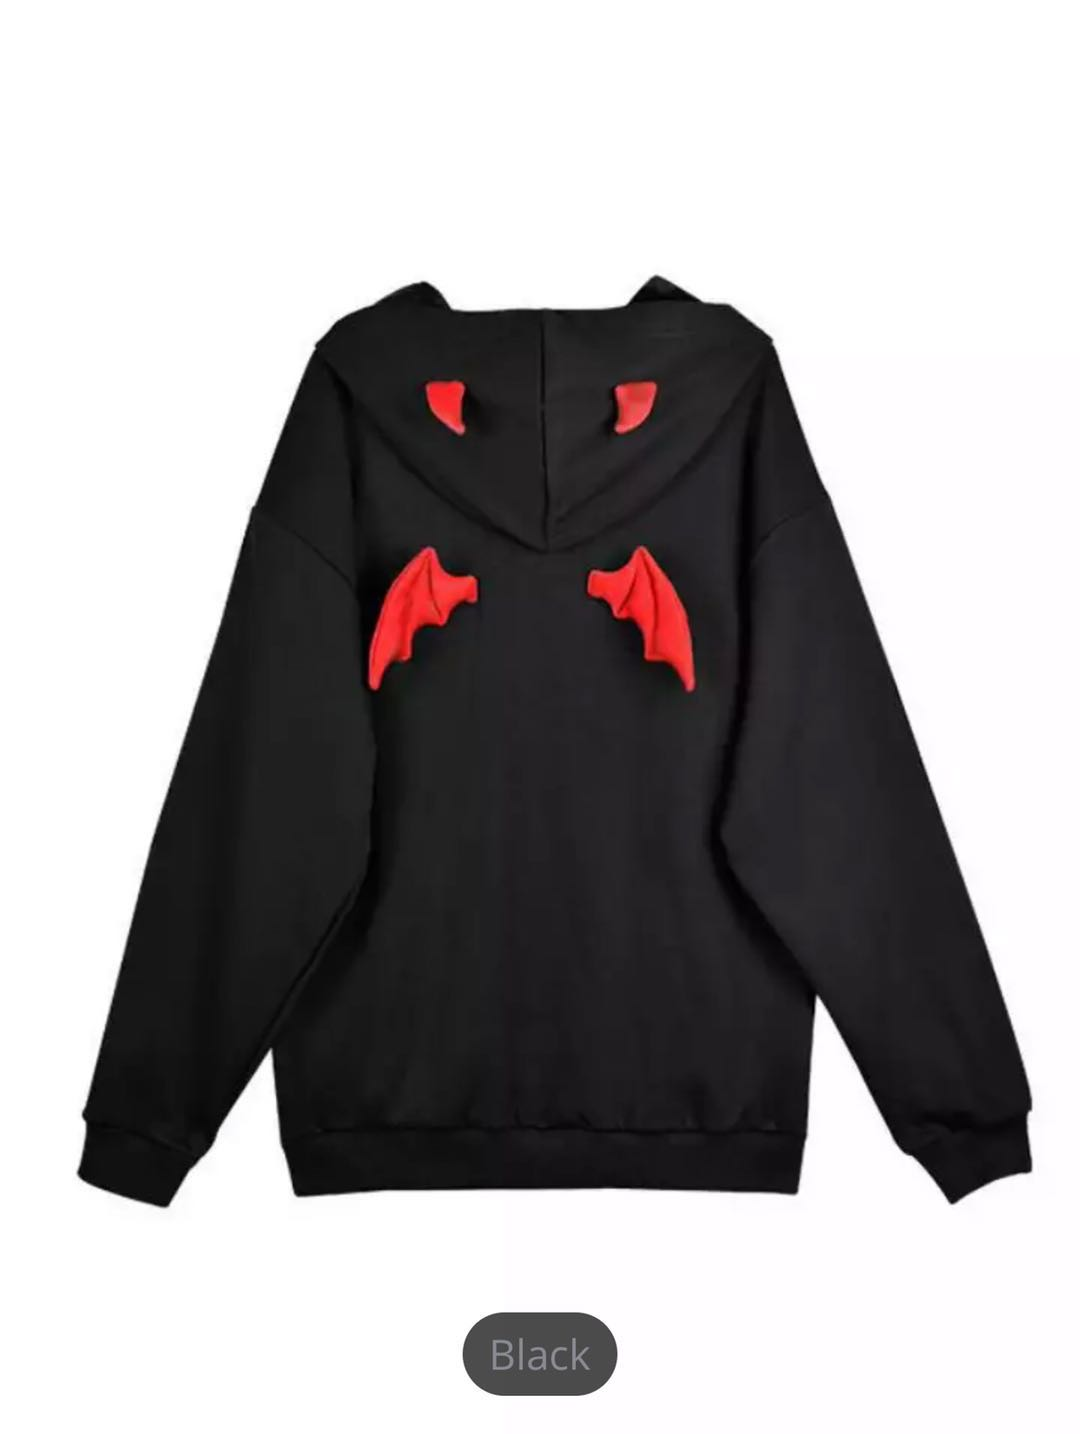 Hooded Sweatshirt With Demon Horns; Gothic Street Sweatshirt; Women's Harajuku Style Loose Black Hoodie